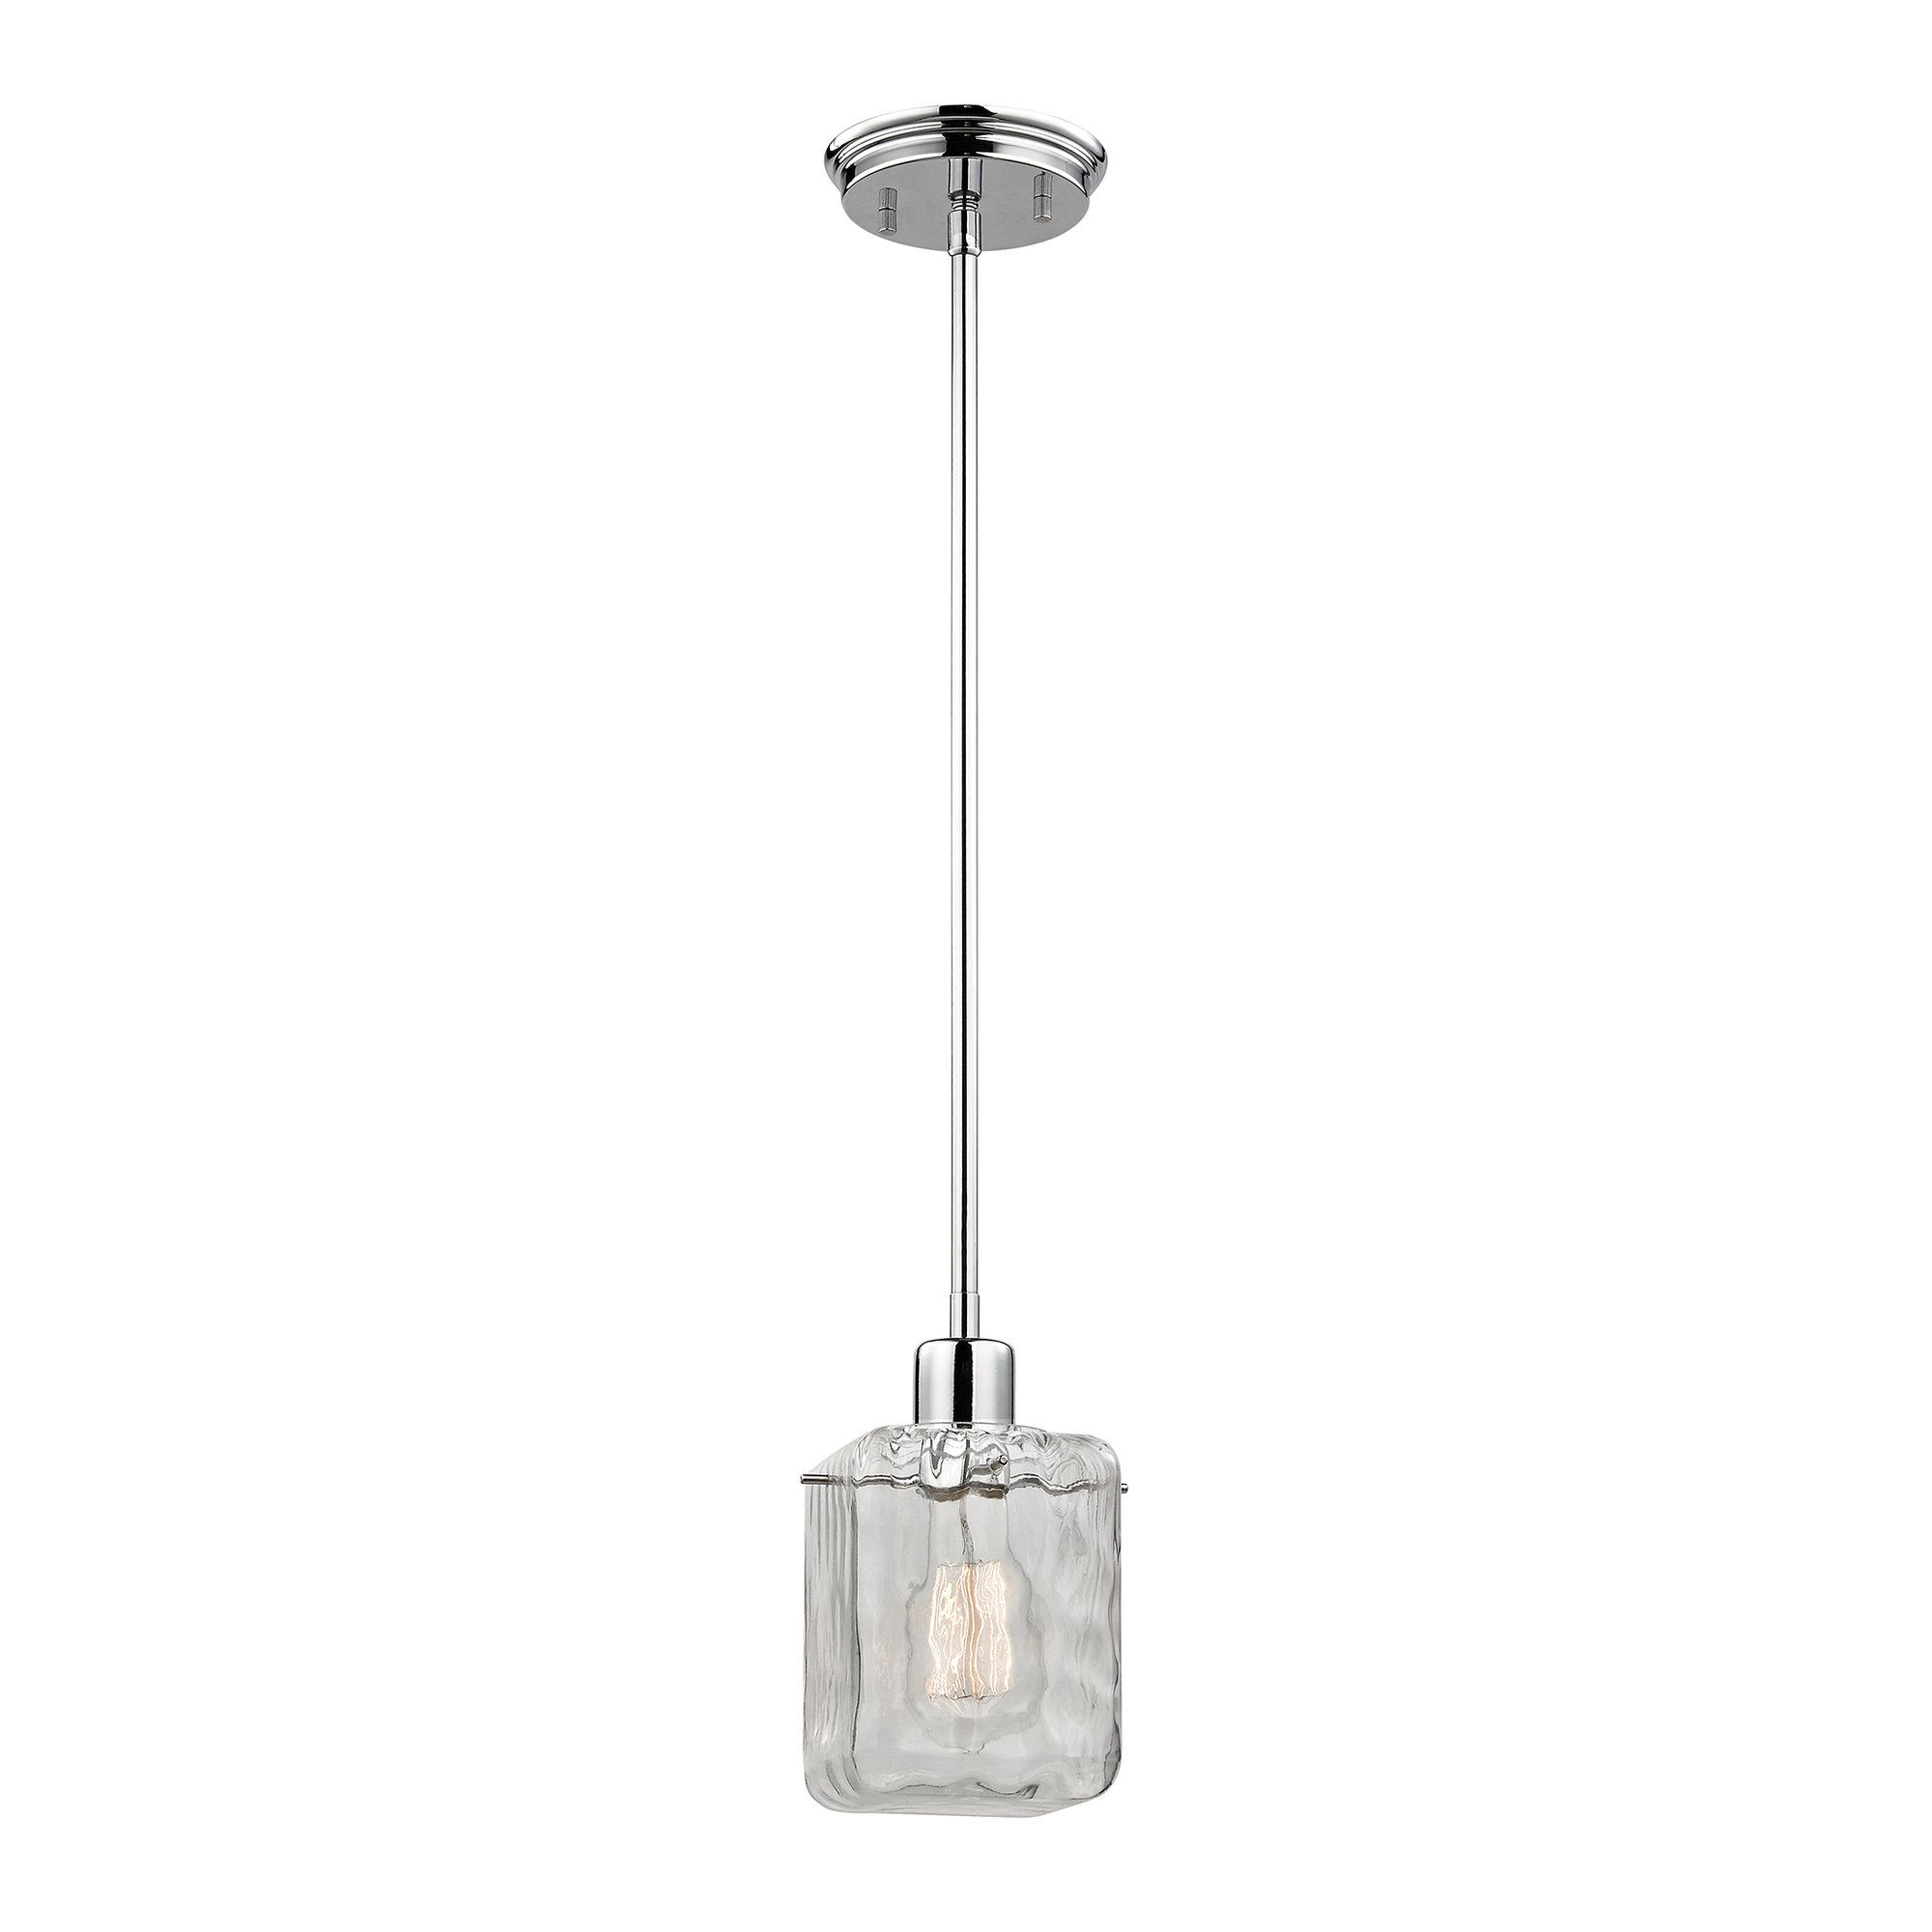 Darion 1 Light Mini Pendant | Products | Pendant Lighting Pertaining To Bellamira 1 Light Drum Pendants (Gallery 19 of 30)